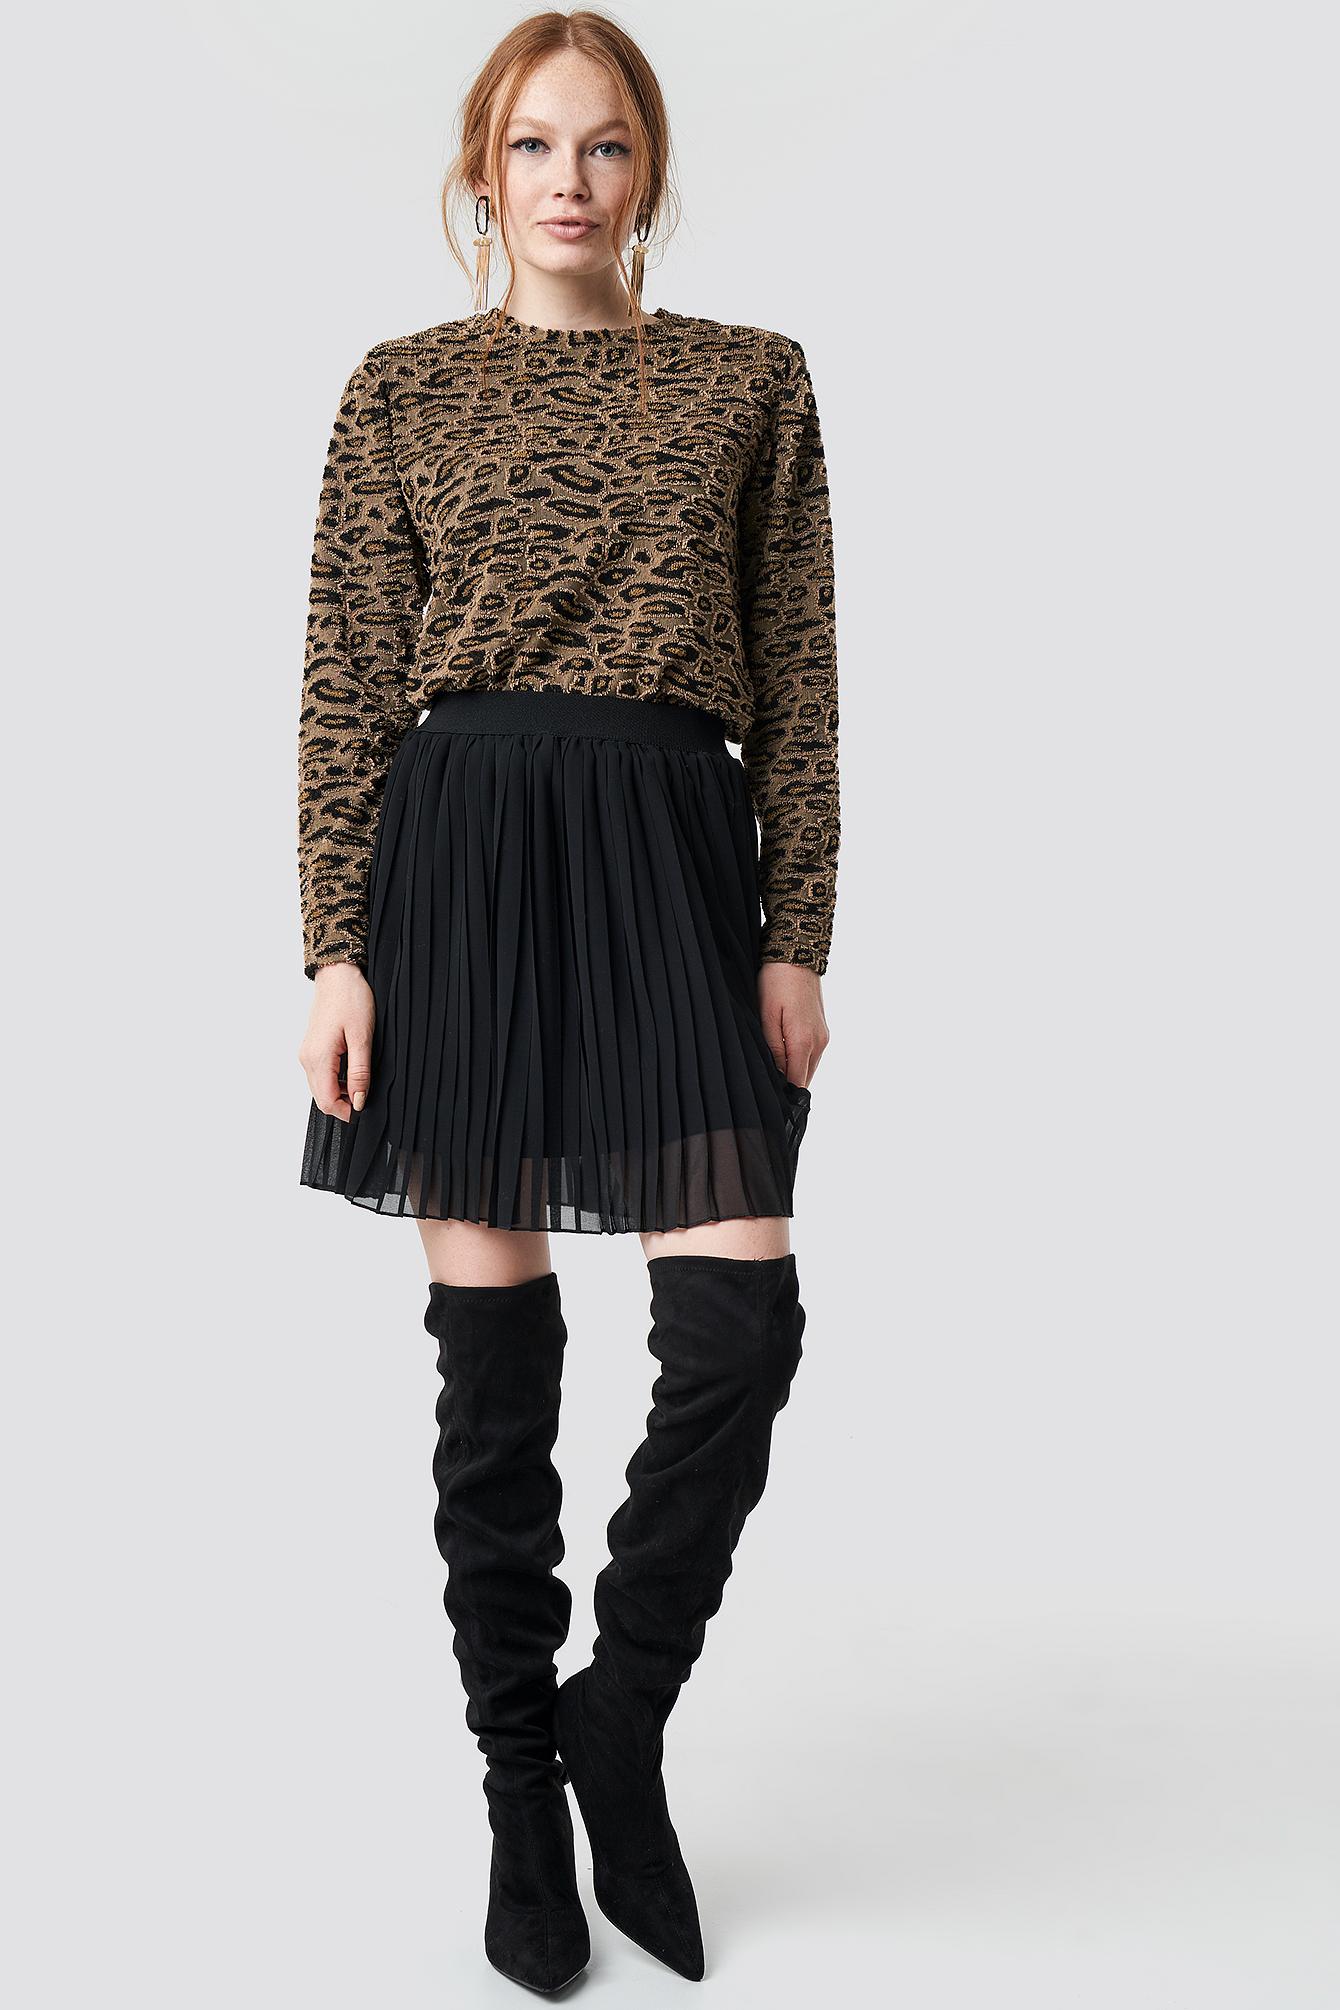 Leopard Print Sweater NA-KD.COM